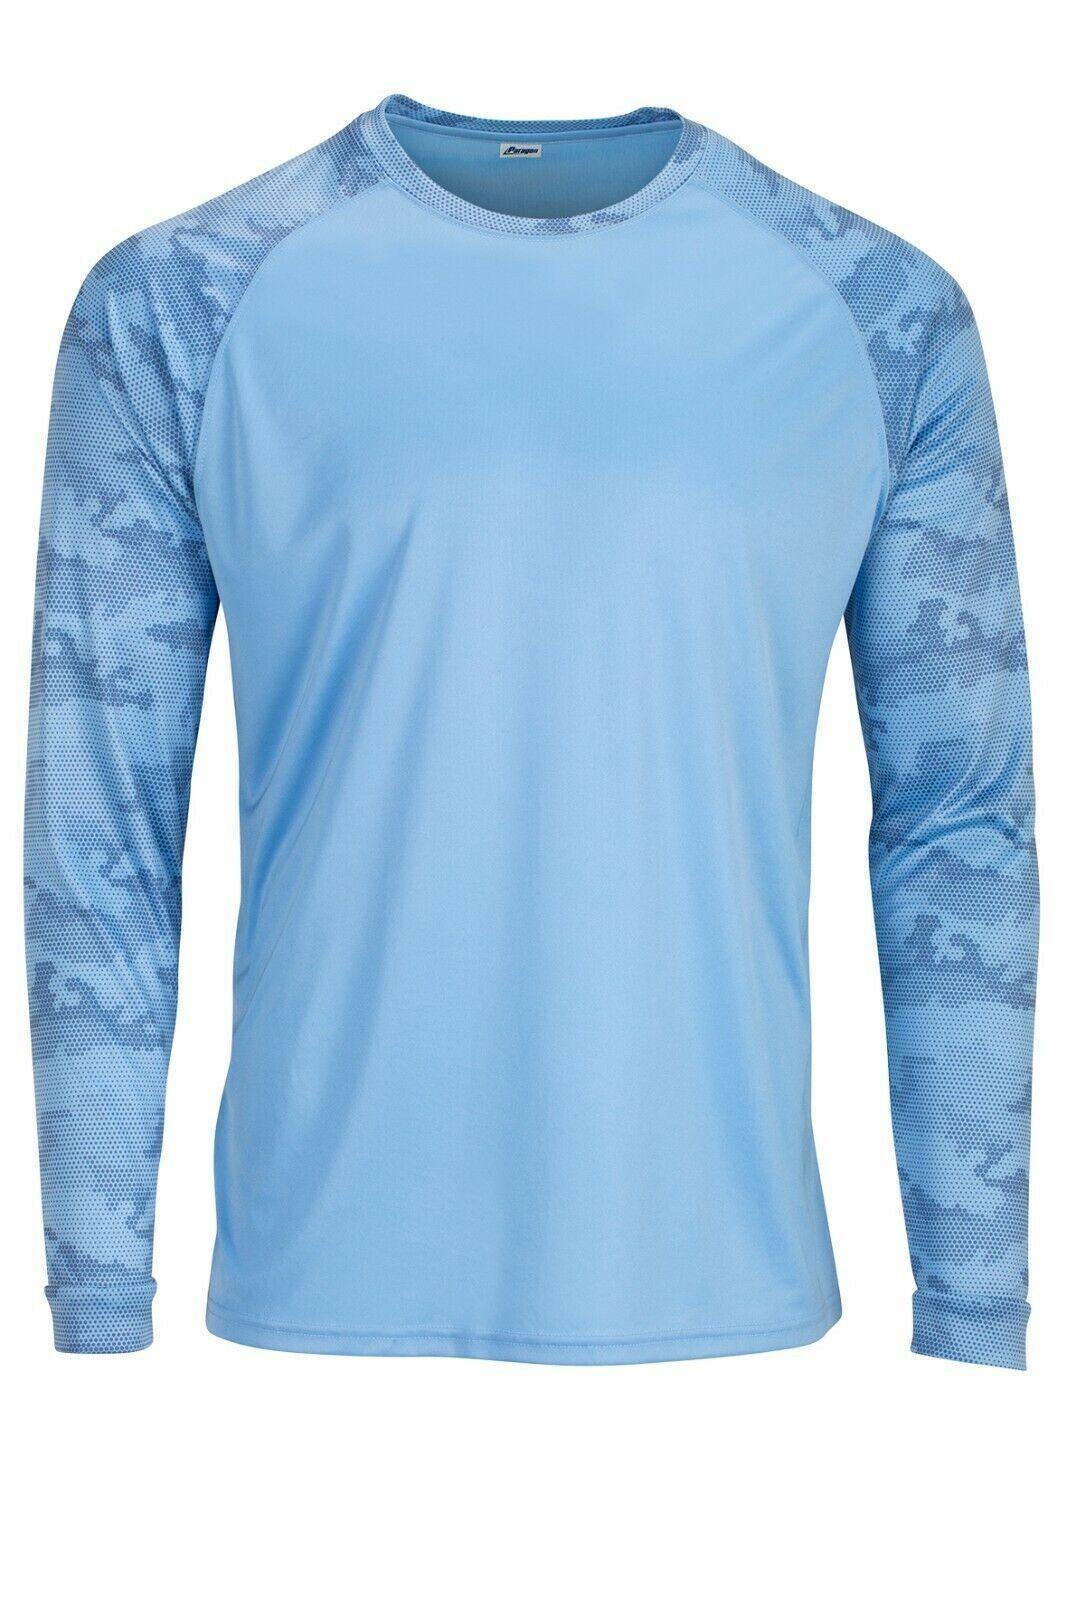 Sun Protection Long Sleeve Dri Fit Blue sun shirt Camo Sleeve base layer SPF 50+